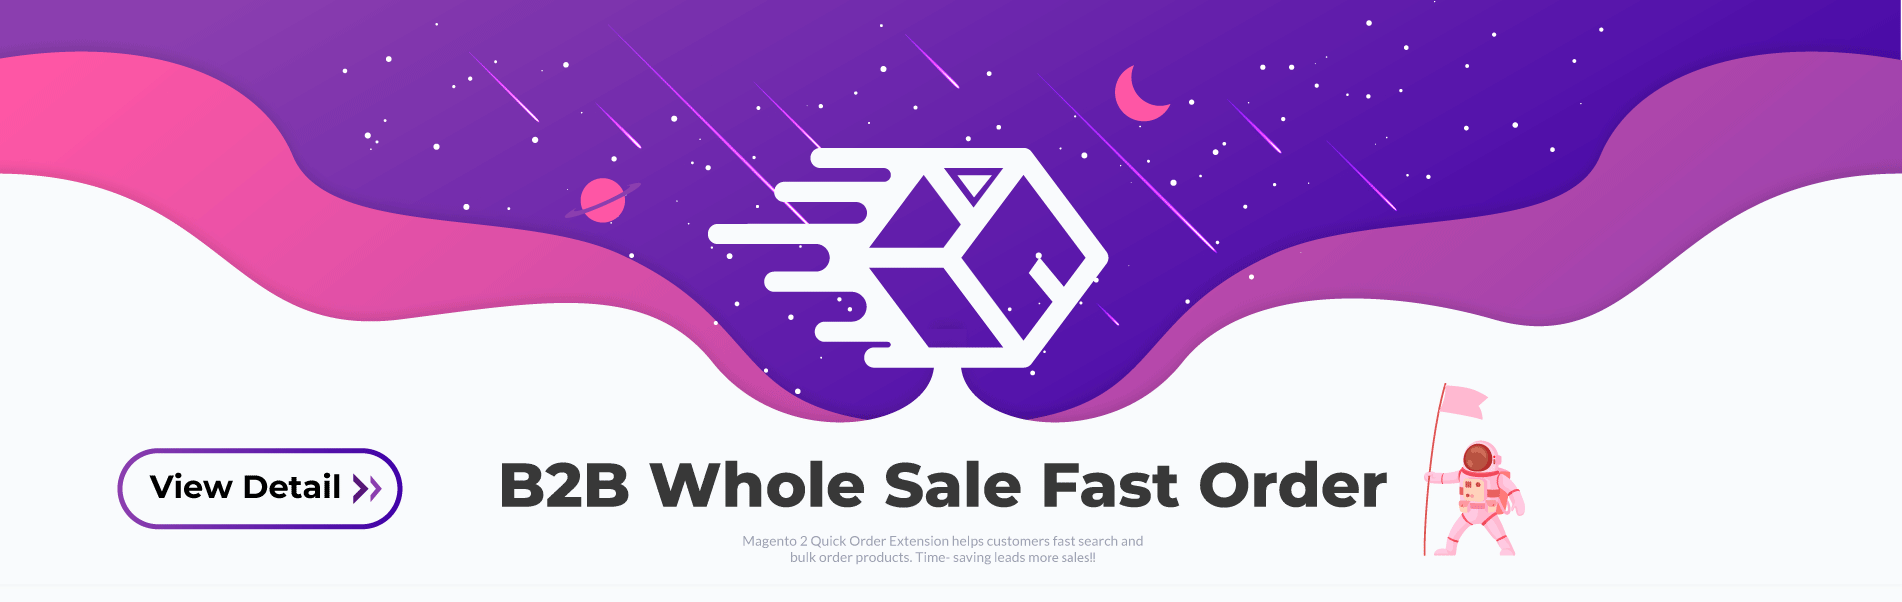 B2b Whole Sale Fast Order